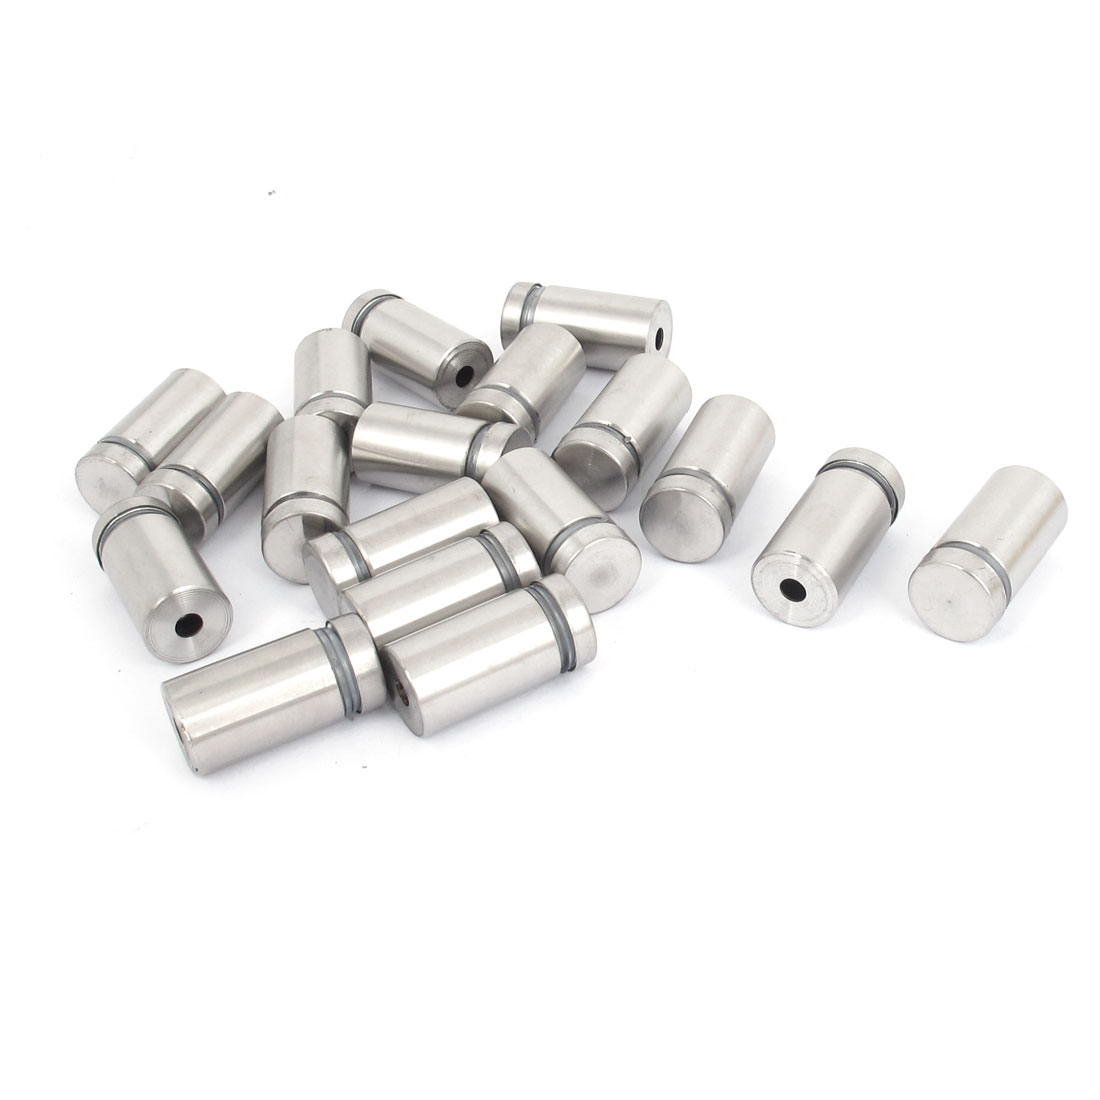 16mm x 30mm Stainless Steel Advertising Frameless Glass Standoff Pins 18pcs